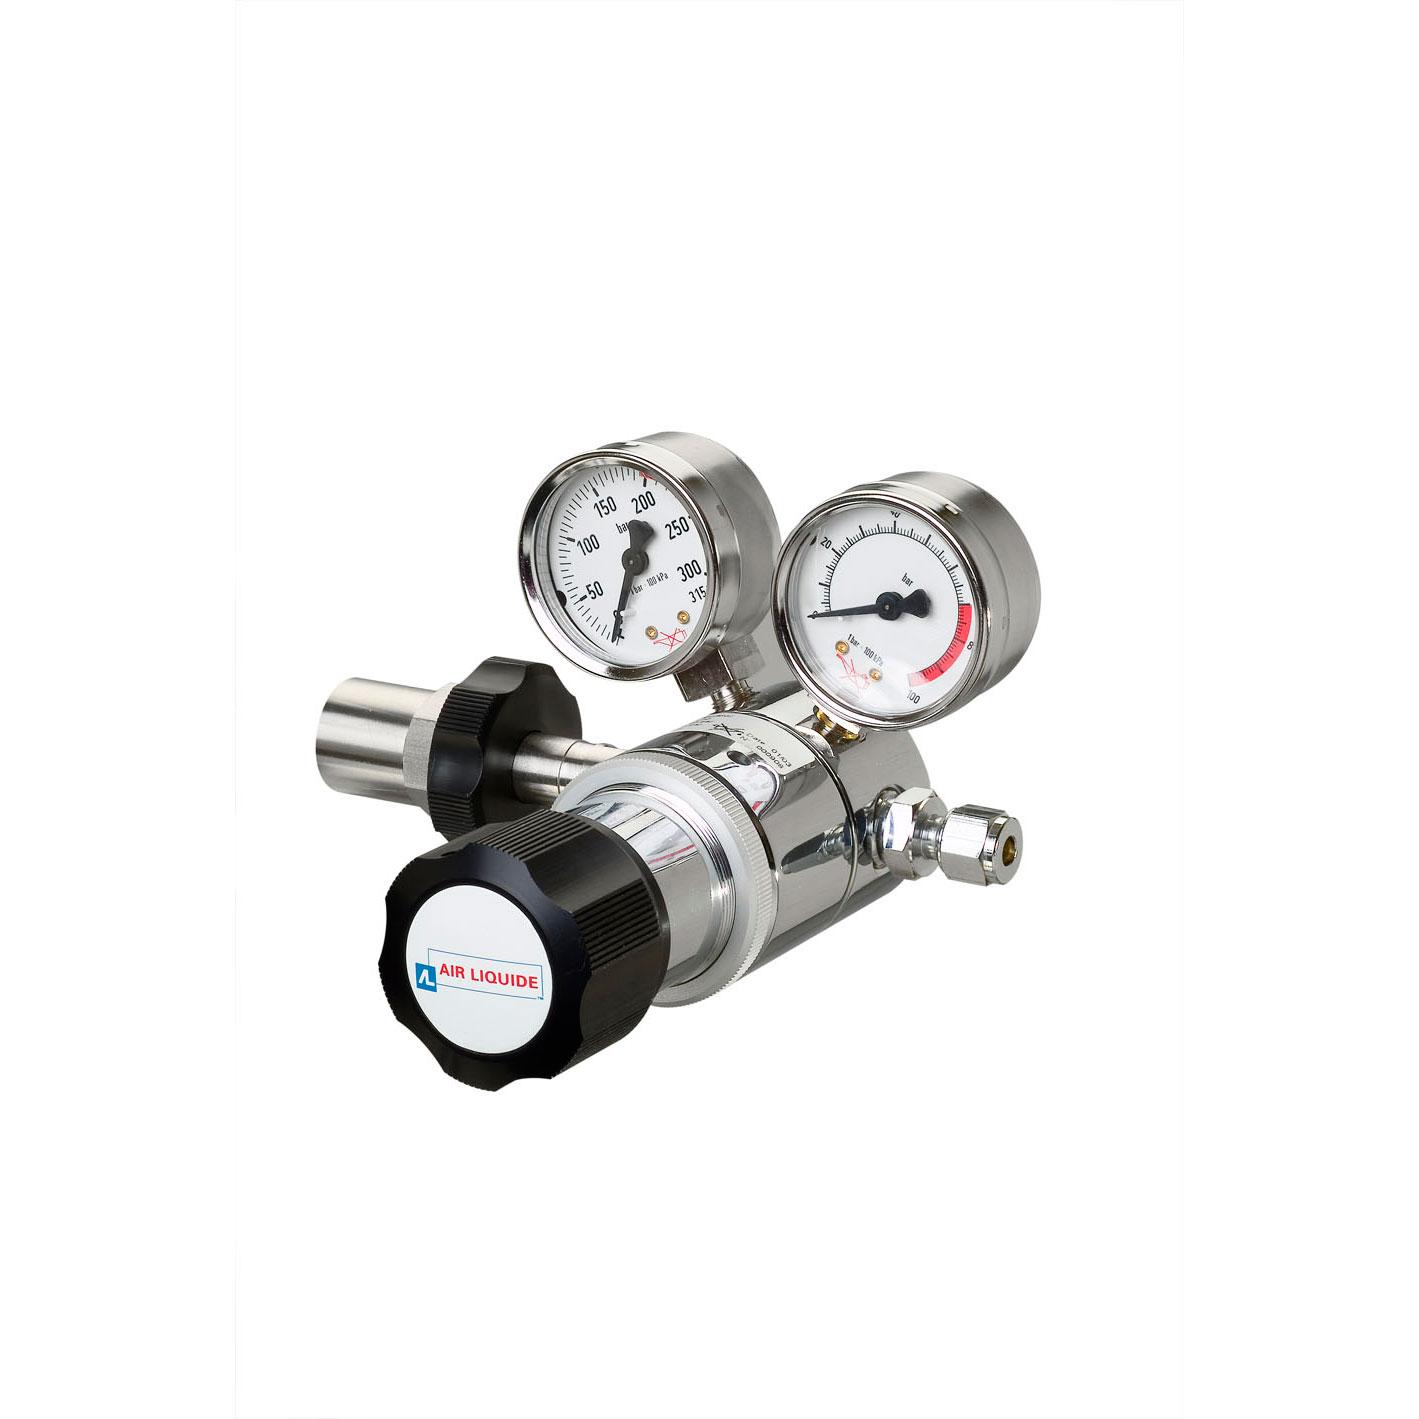 DHP 200-200-30